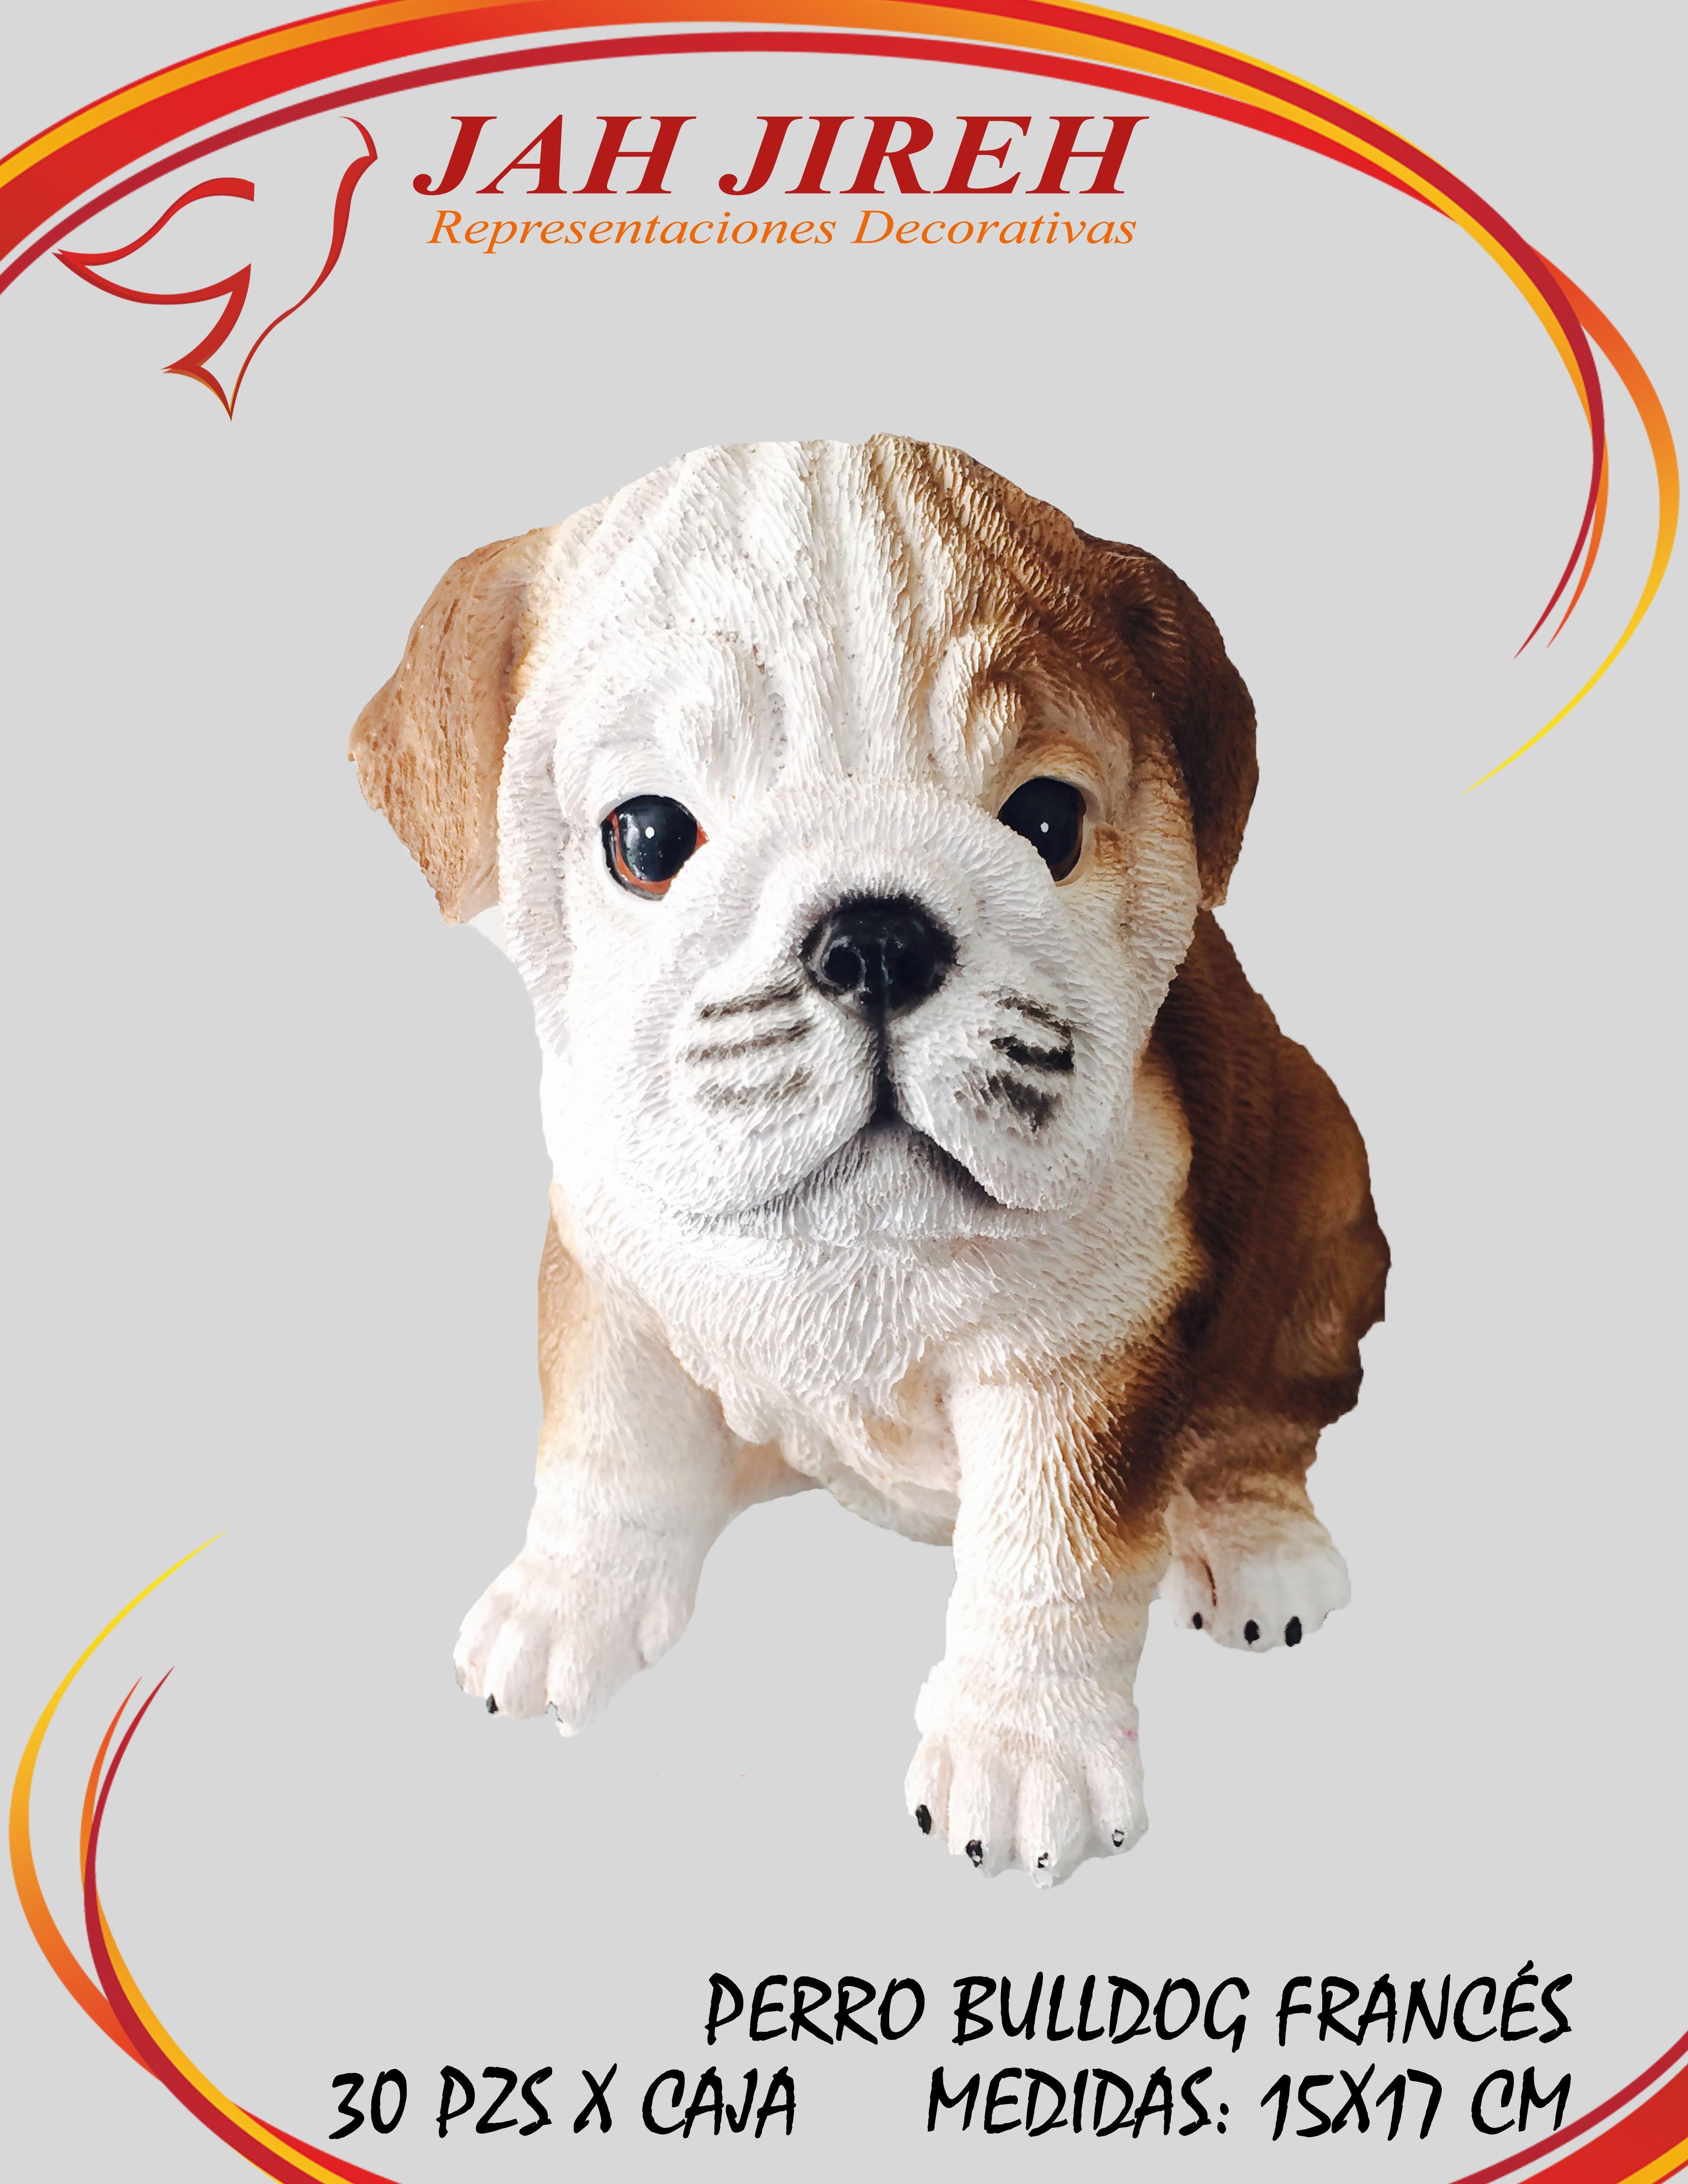 https://0201.nccdn.net/1_2/000/000/11c/ae9/perro-bulldog-franc--s.jpg